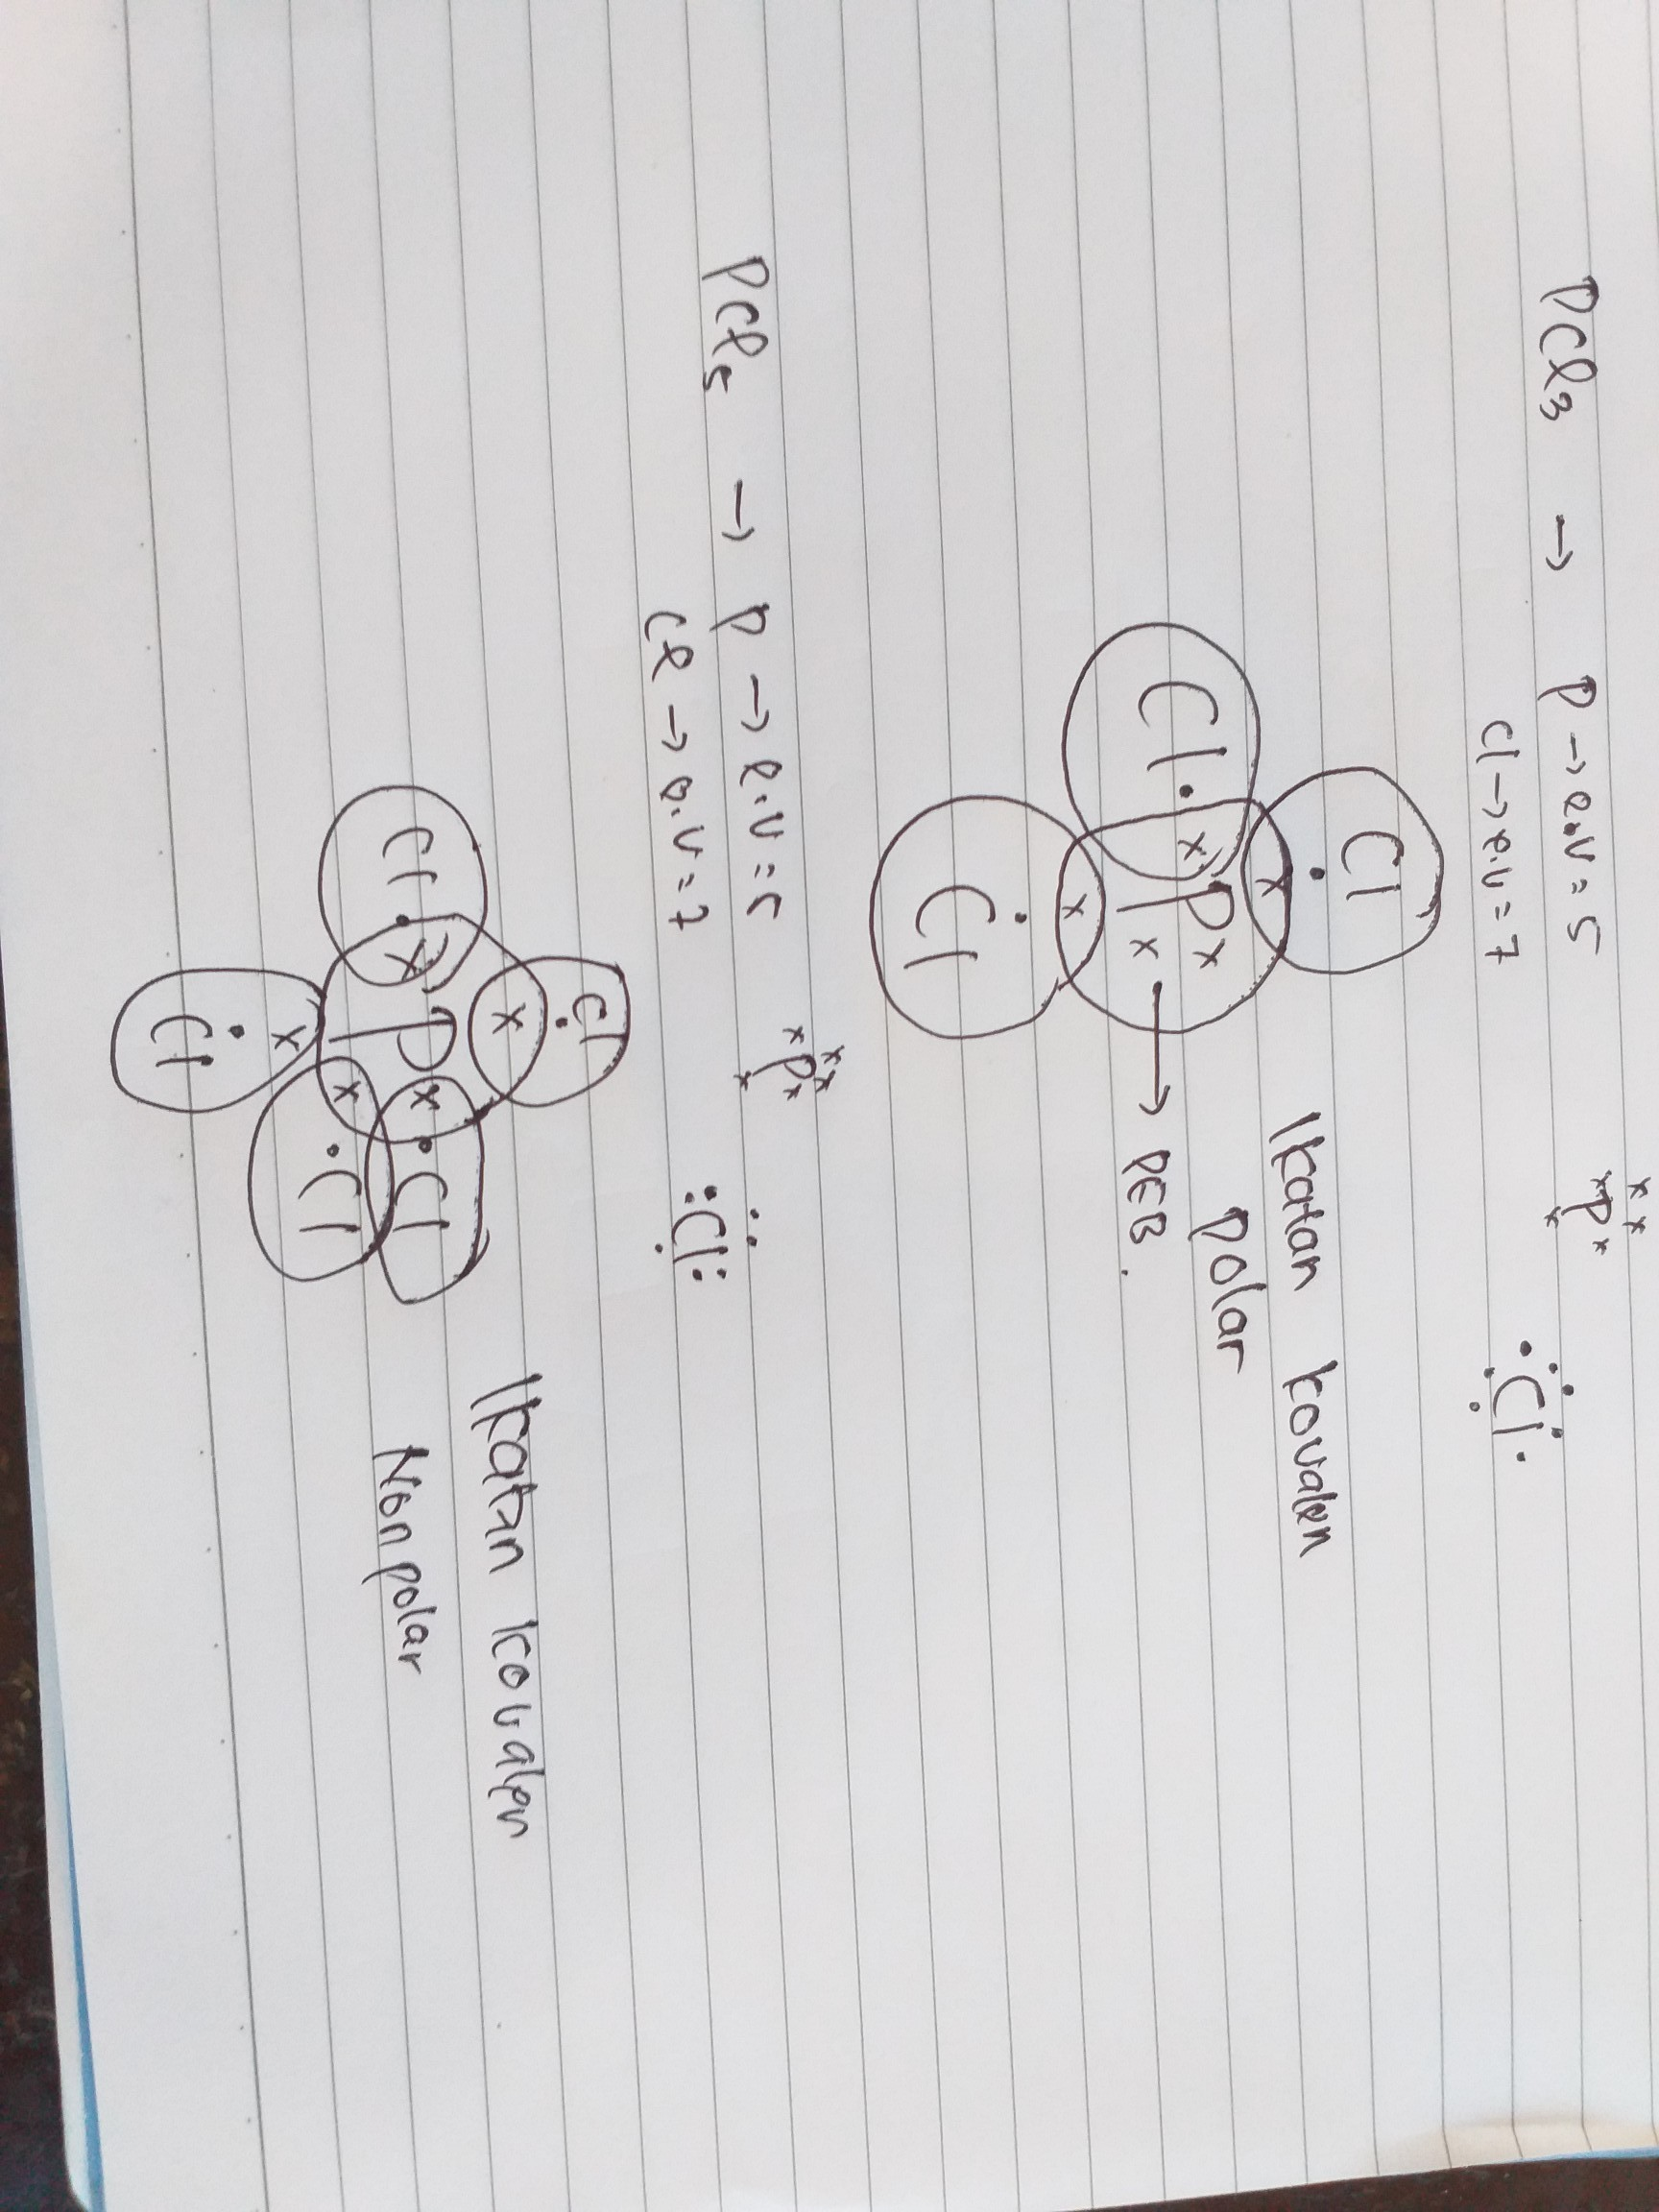 Tuliskan Struktur Leuwis Jenis Ikatan Bilangan Formal Dan Sifat Kepolaran Dari Senyawa Pcl3 Dan Brainly Co Id